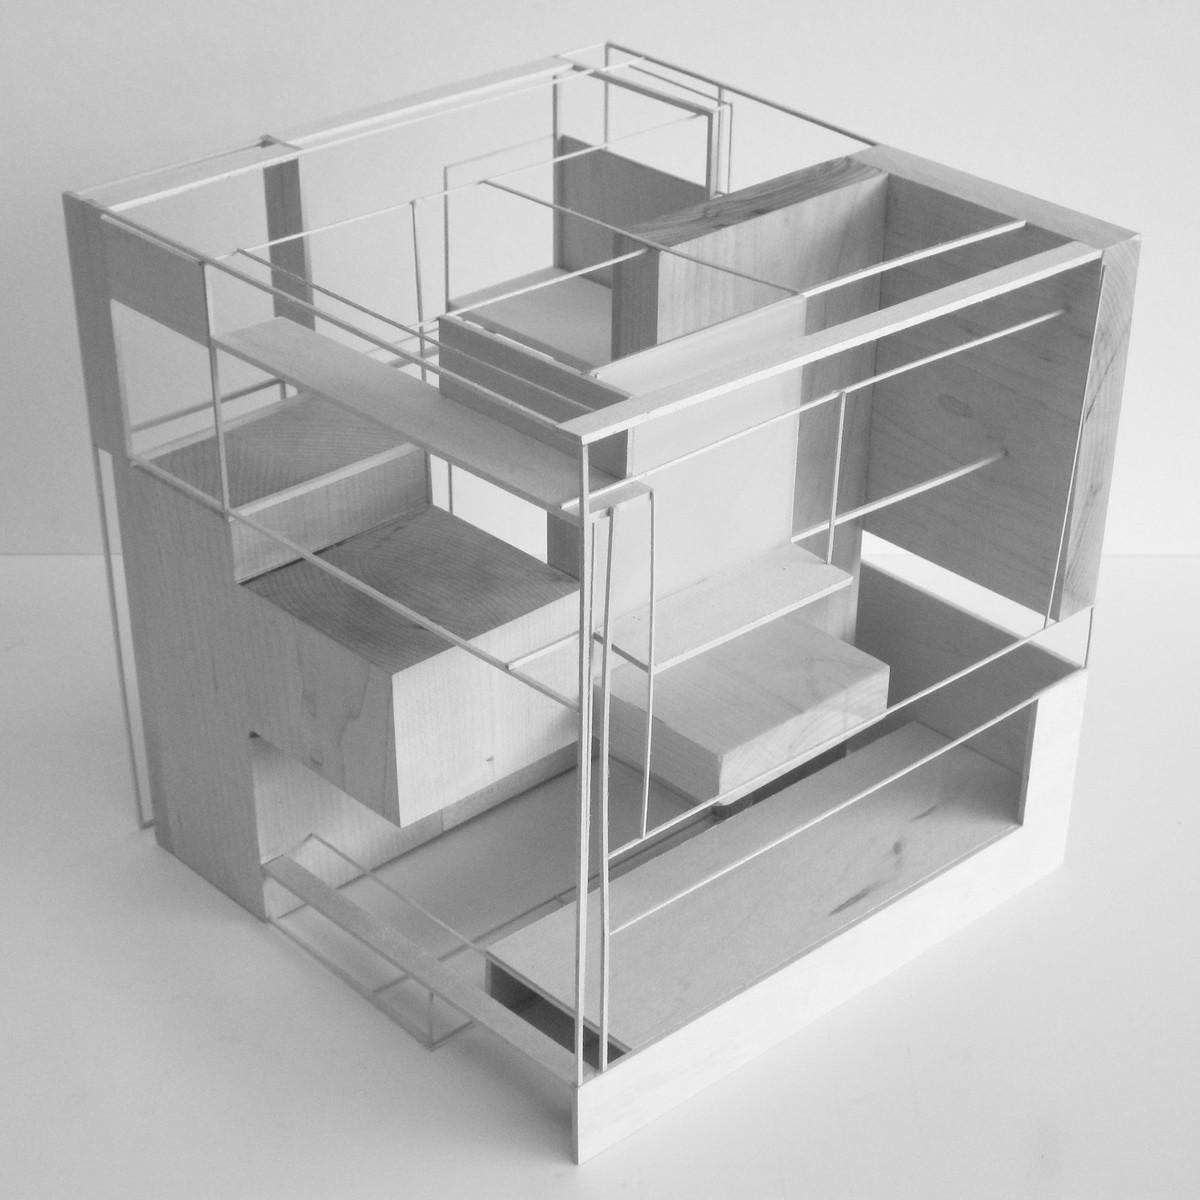 cube construct final design proposal branko micic archinect. Black Bedroom Furniture Sets. Home Design Ideas